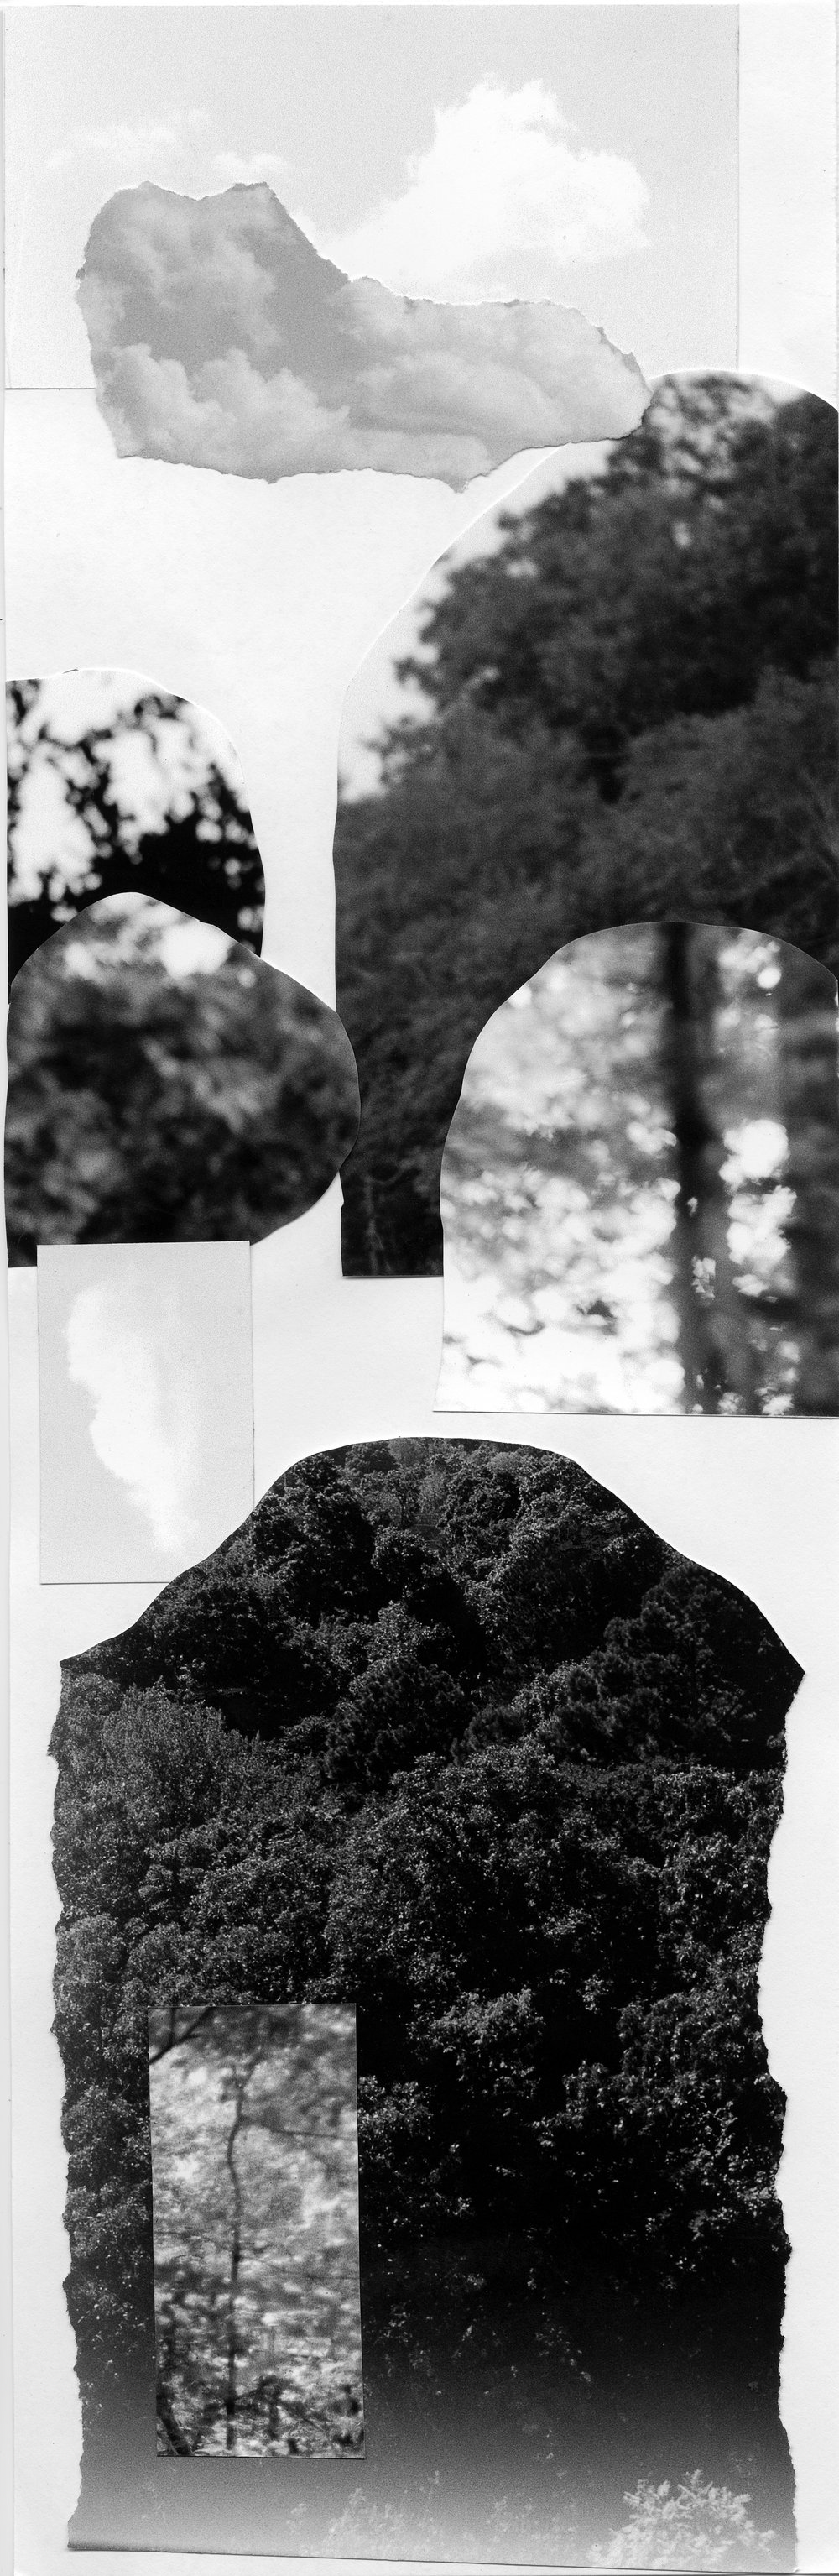 CollageTop 1.jpg